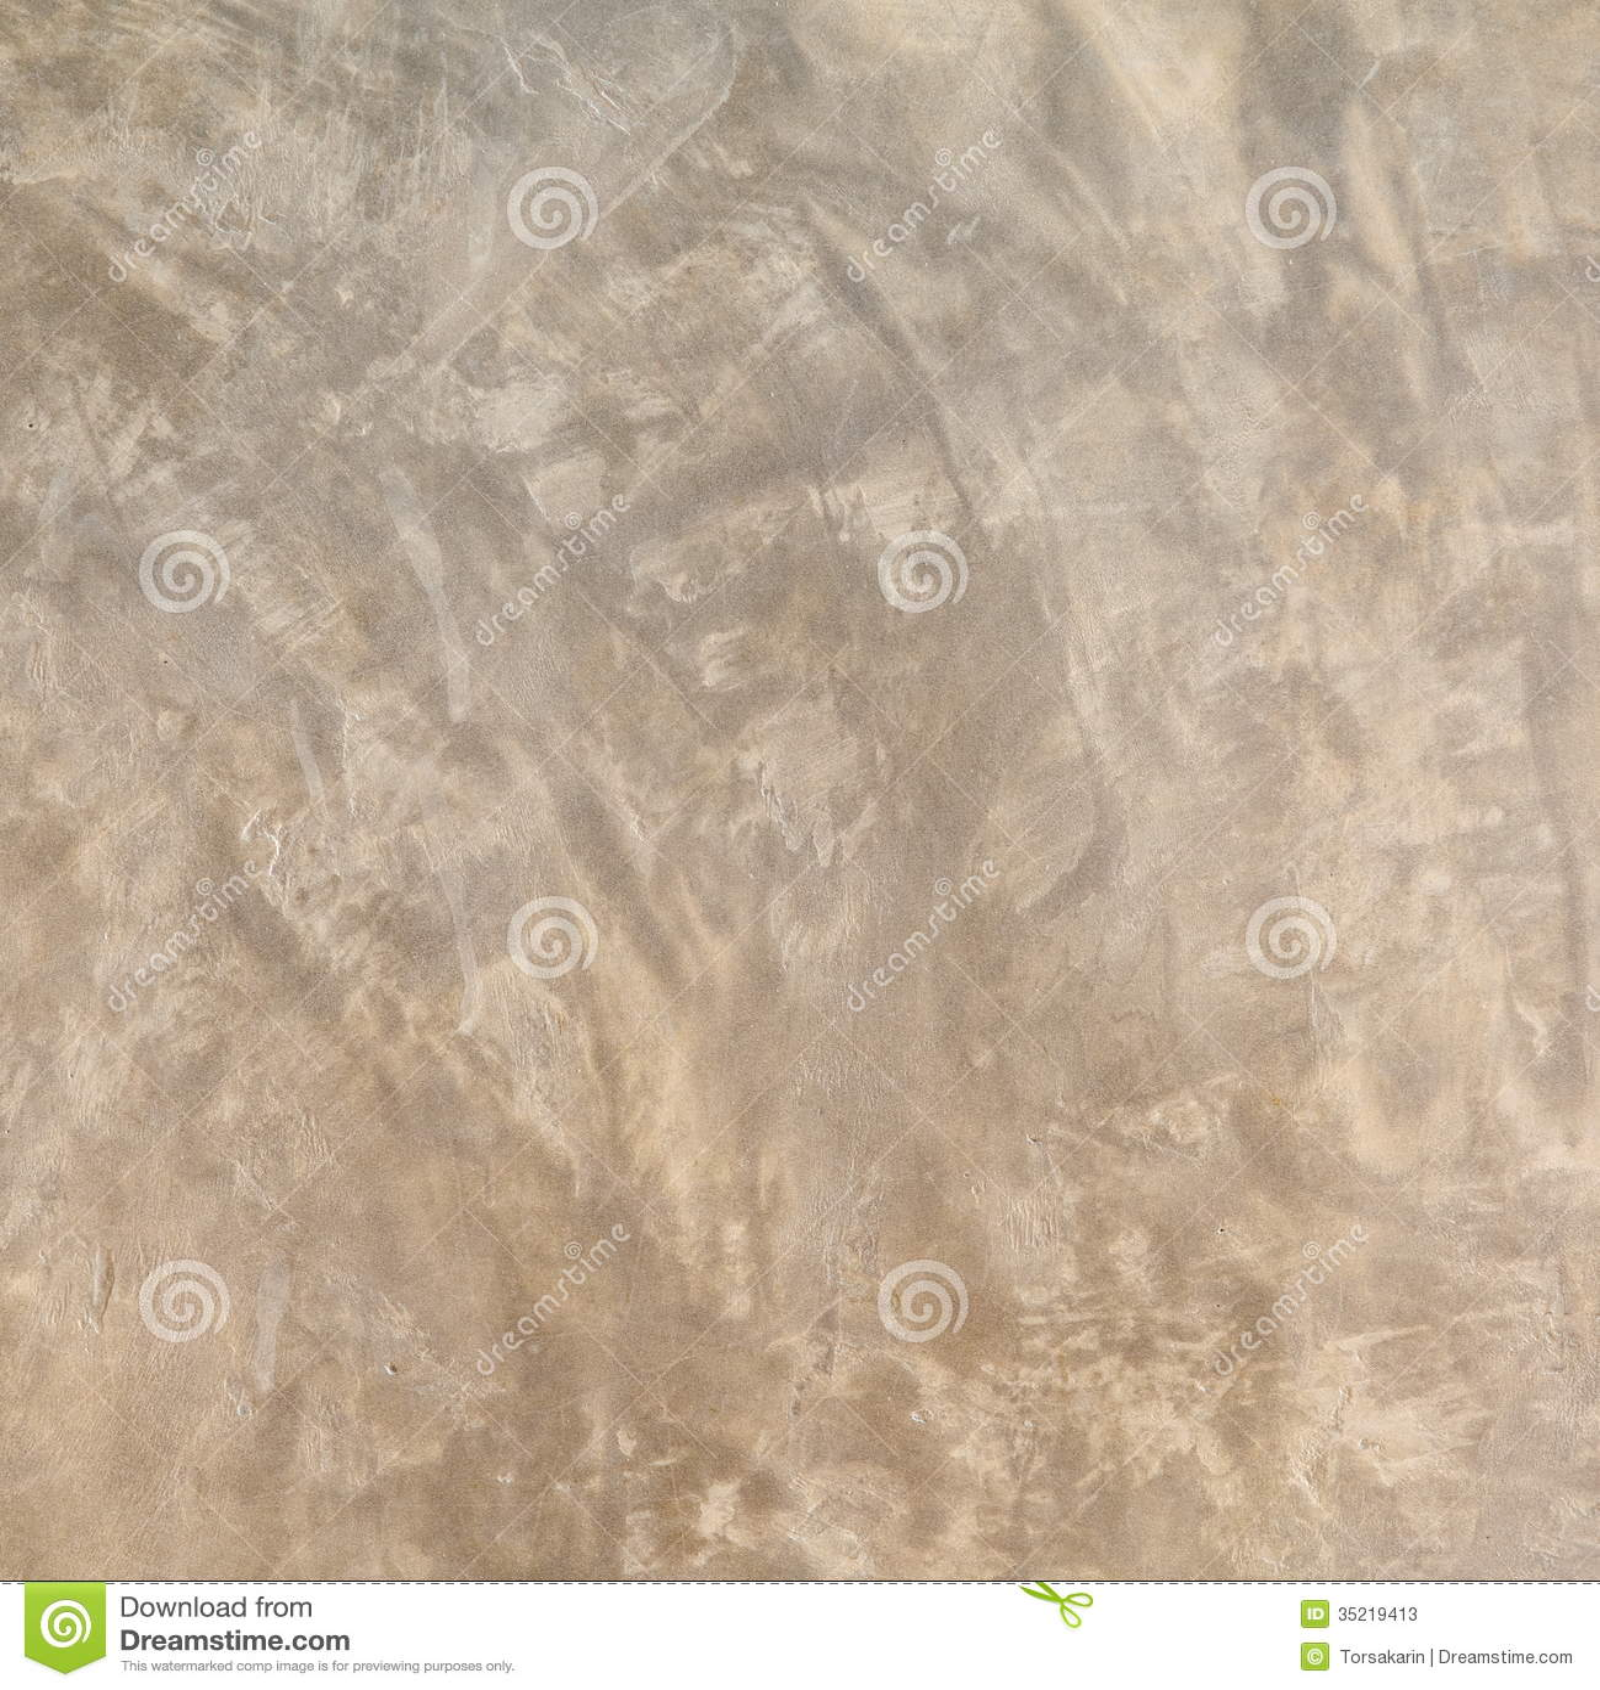 Concrete Floor Texture Concrete floor texture